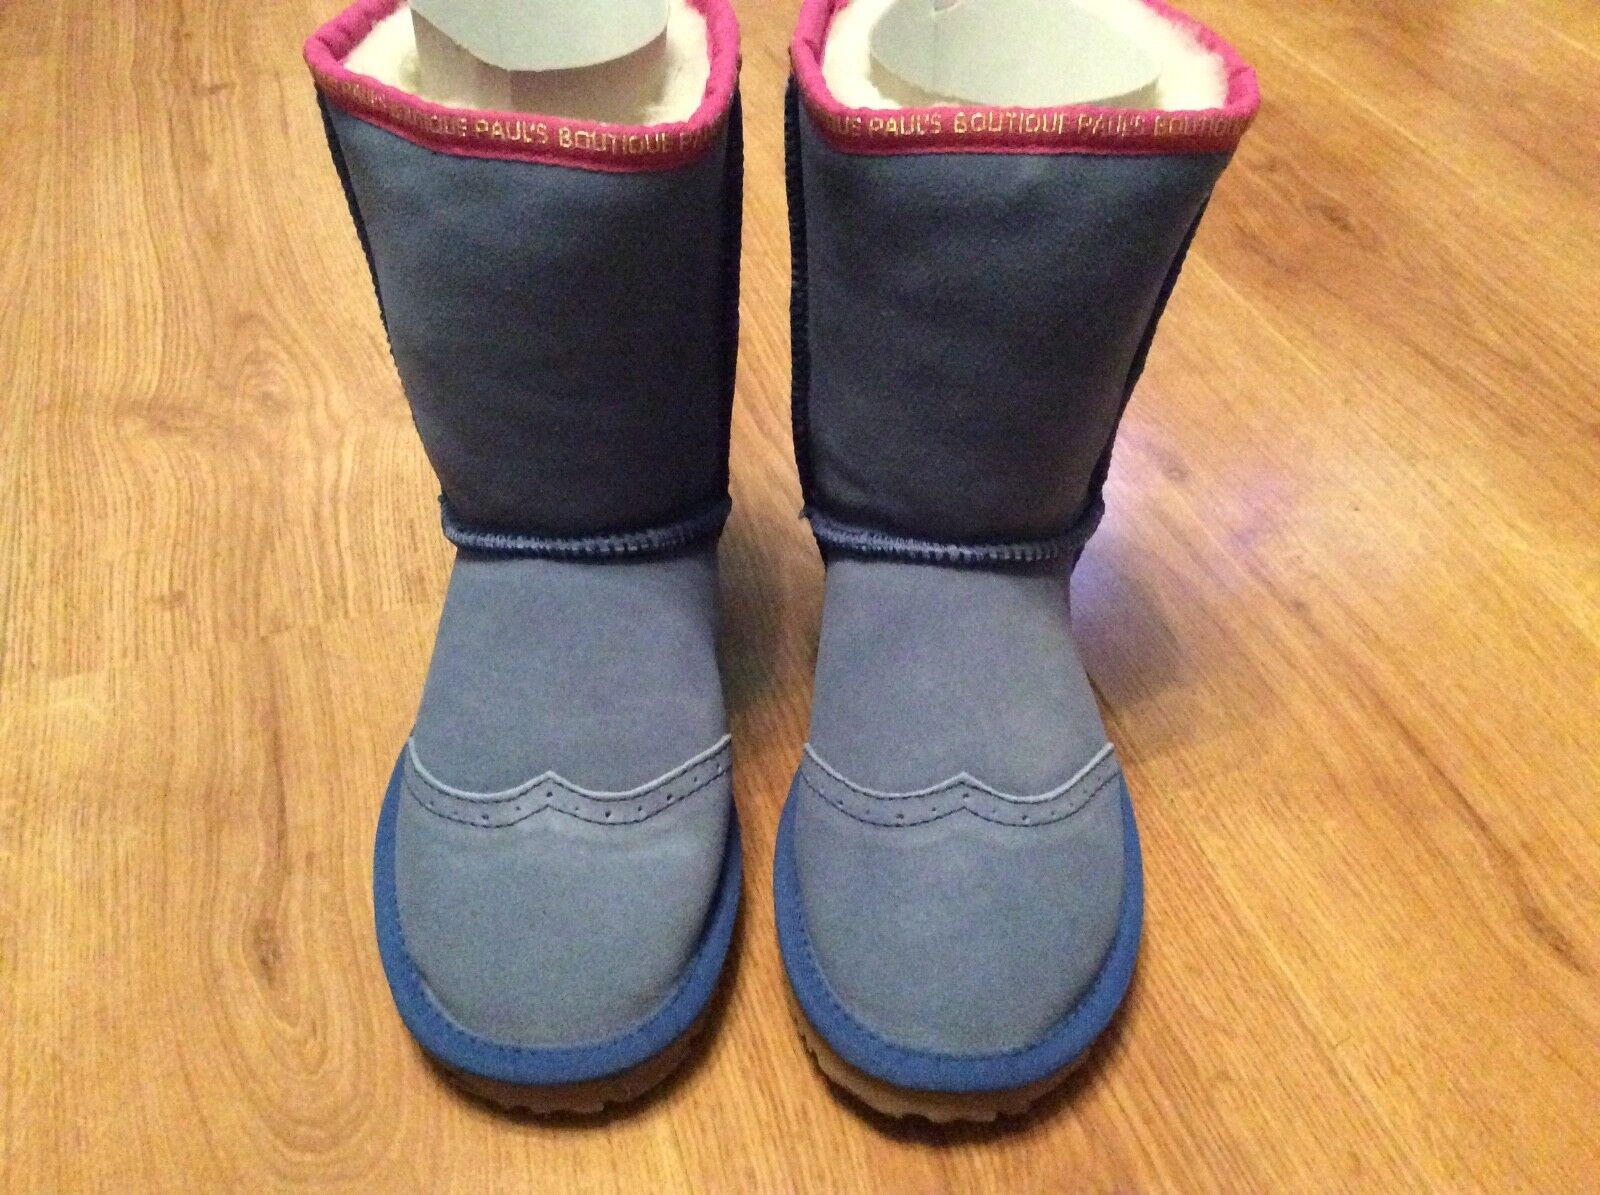 Paul's Boutique De Piel De Oveja botas al tobillo